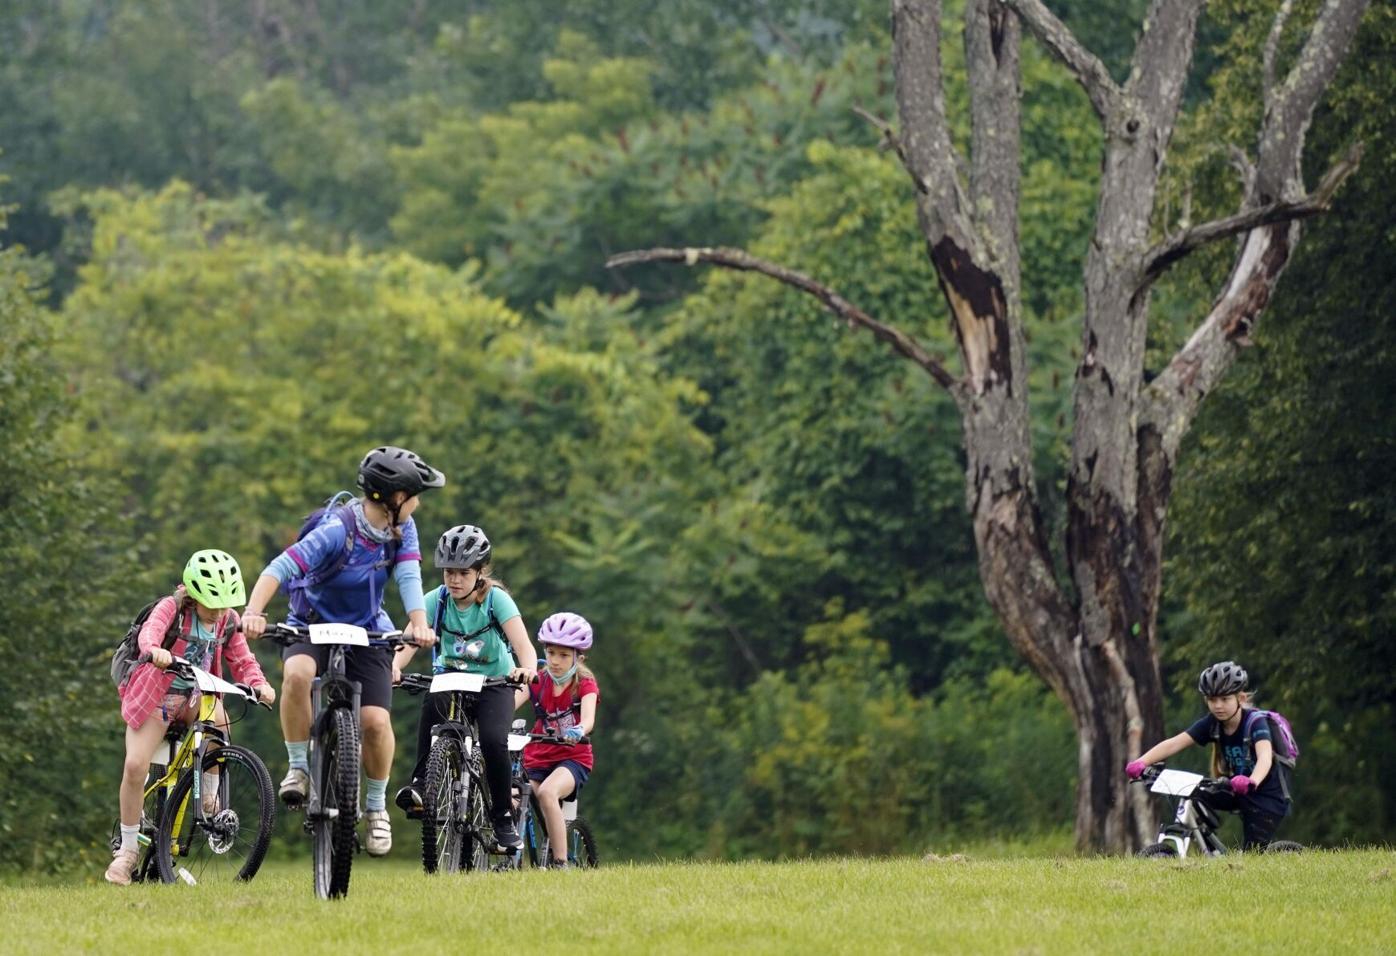 Bikers riding in Springside Park